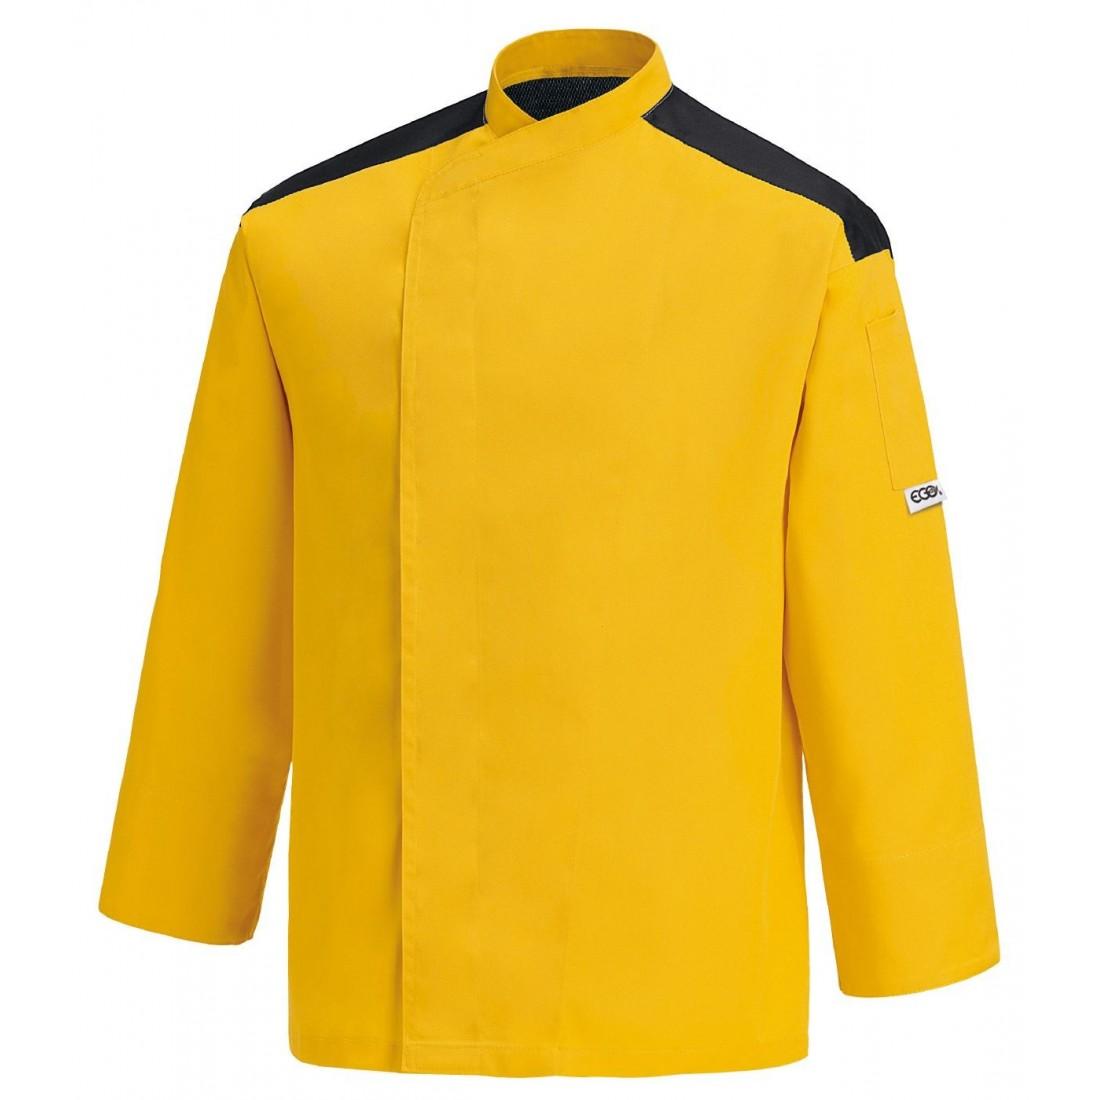 Chaqueta cocina yellow first 2041012C